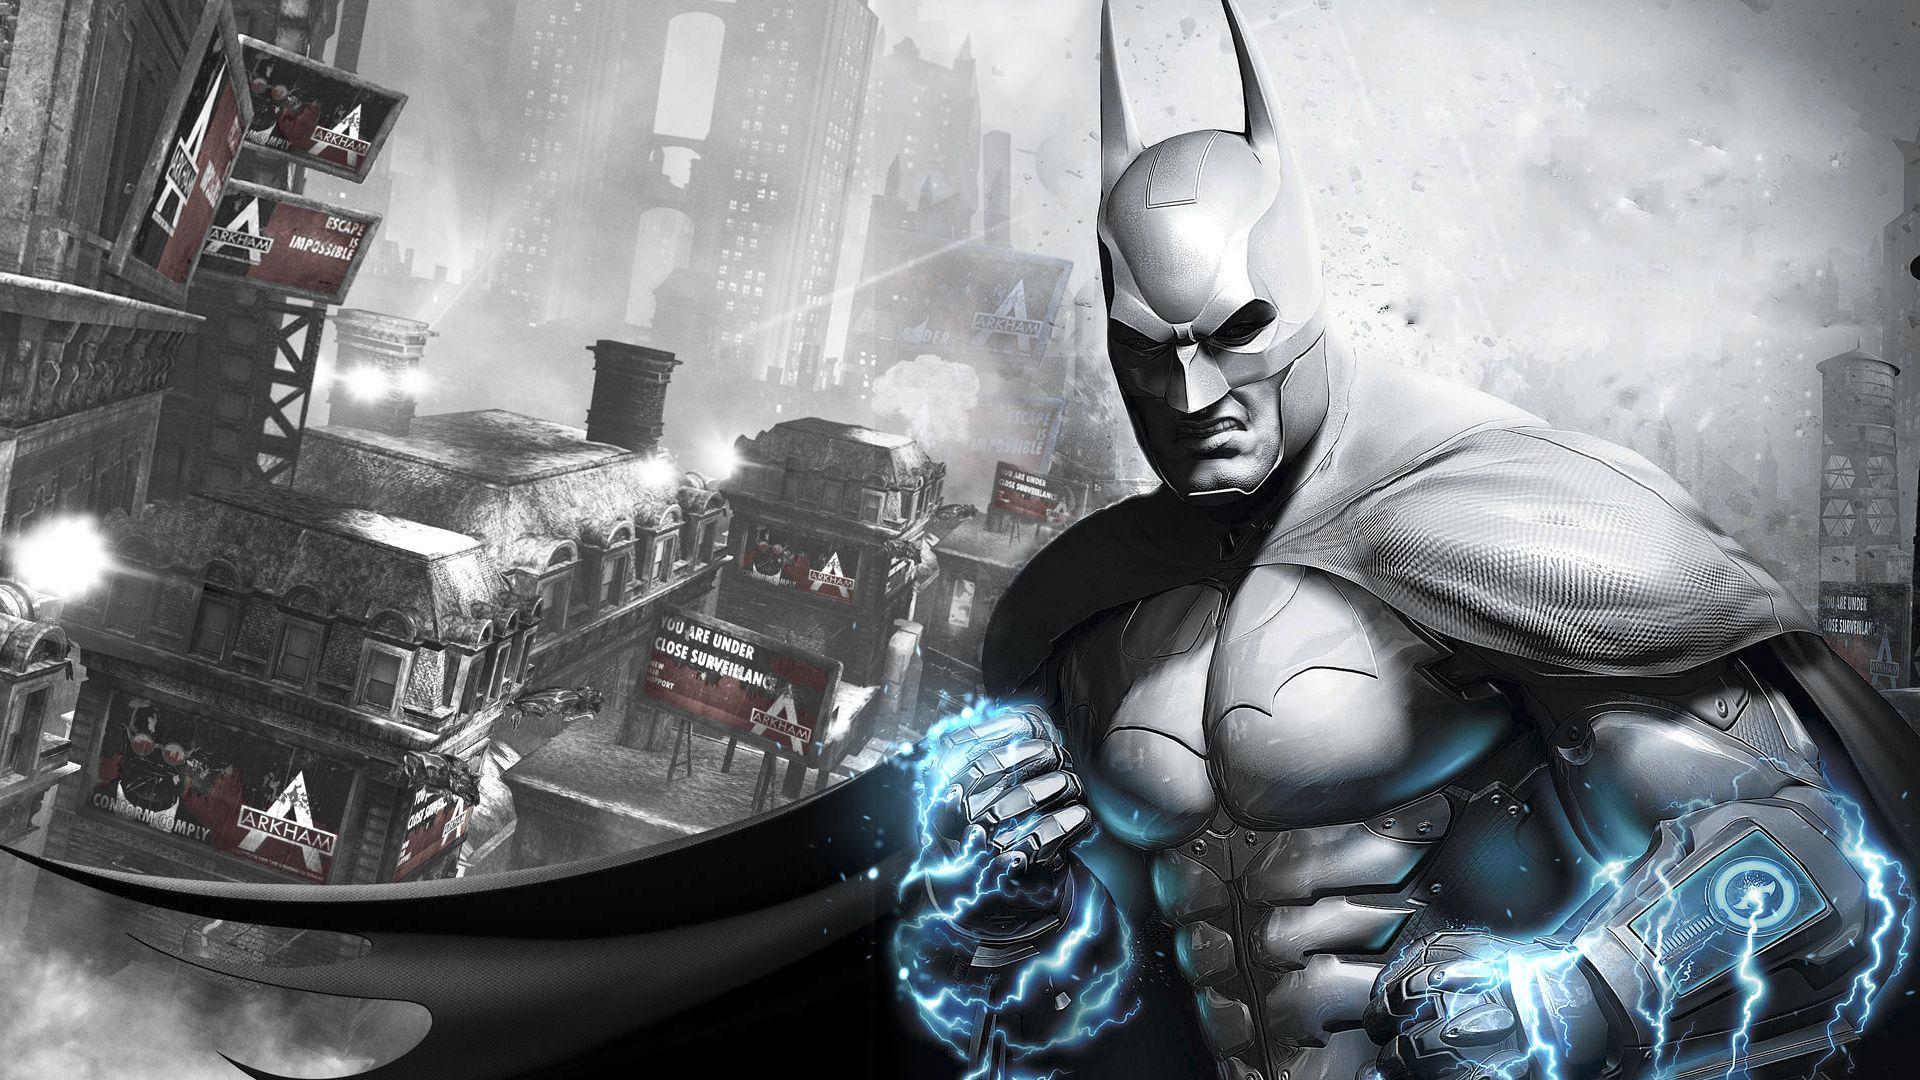 batman arkham asylum iphone hd wallpaper | hd wallpapers | pinterest